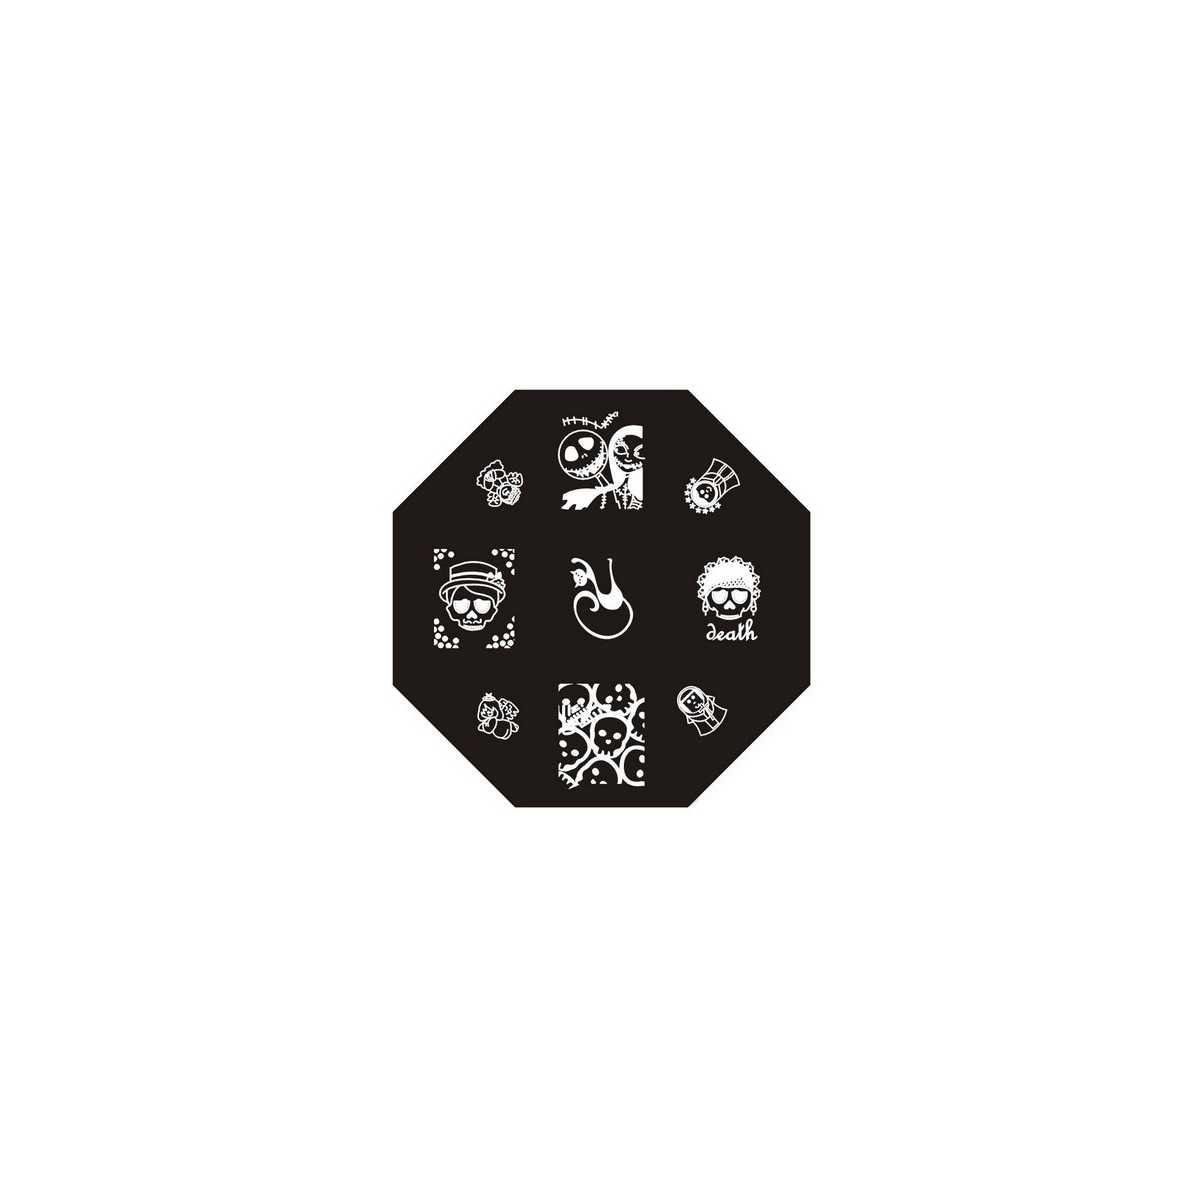 https://www.kit-manucure.com/623-thickbox_default/plaque-de-stamping-tête-de-mort-chat-et-halloween.jpg